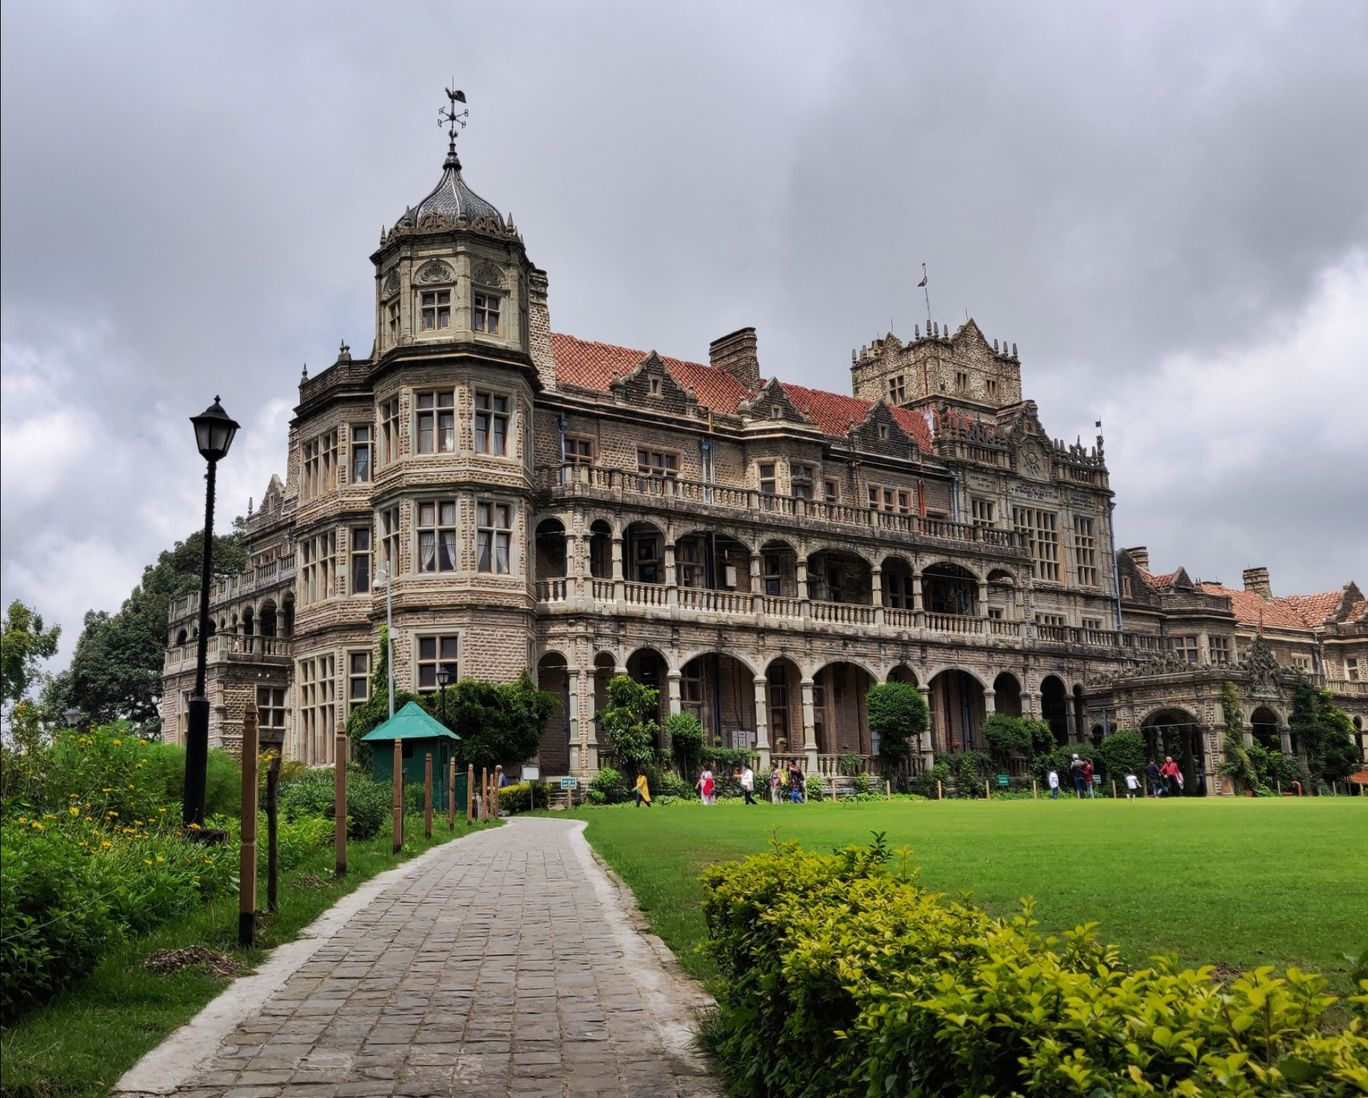 Photo of Viceregal Lodge & Botanical Gardens By Aman Kumar